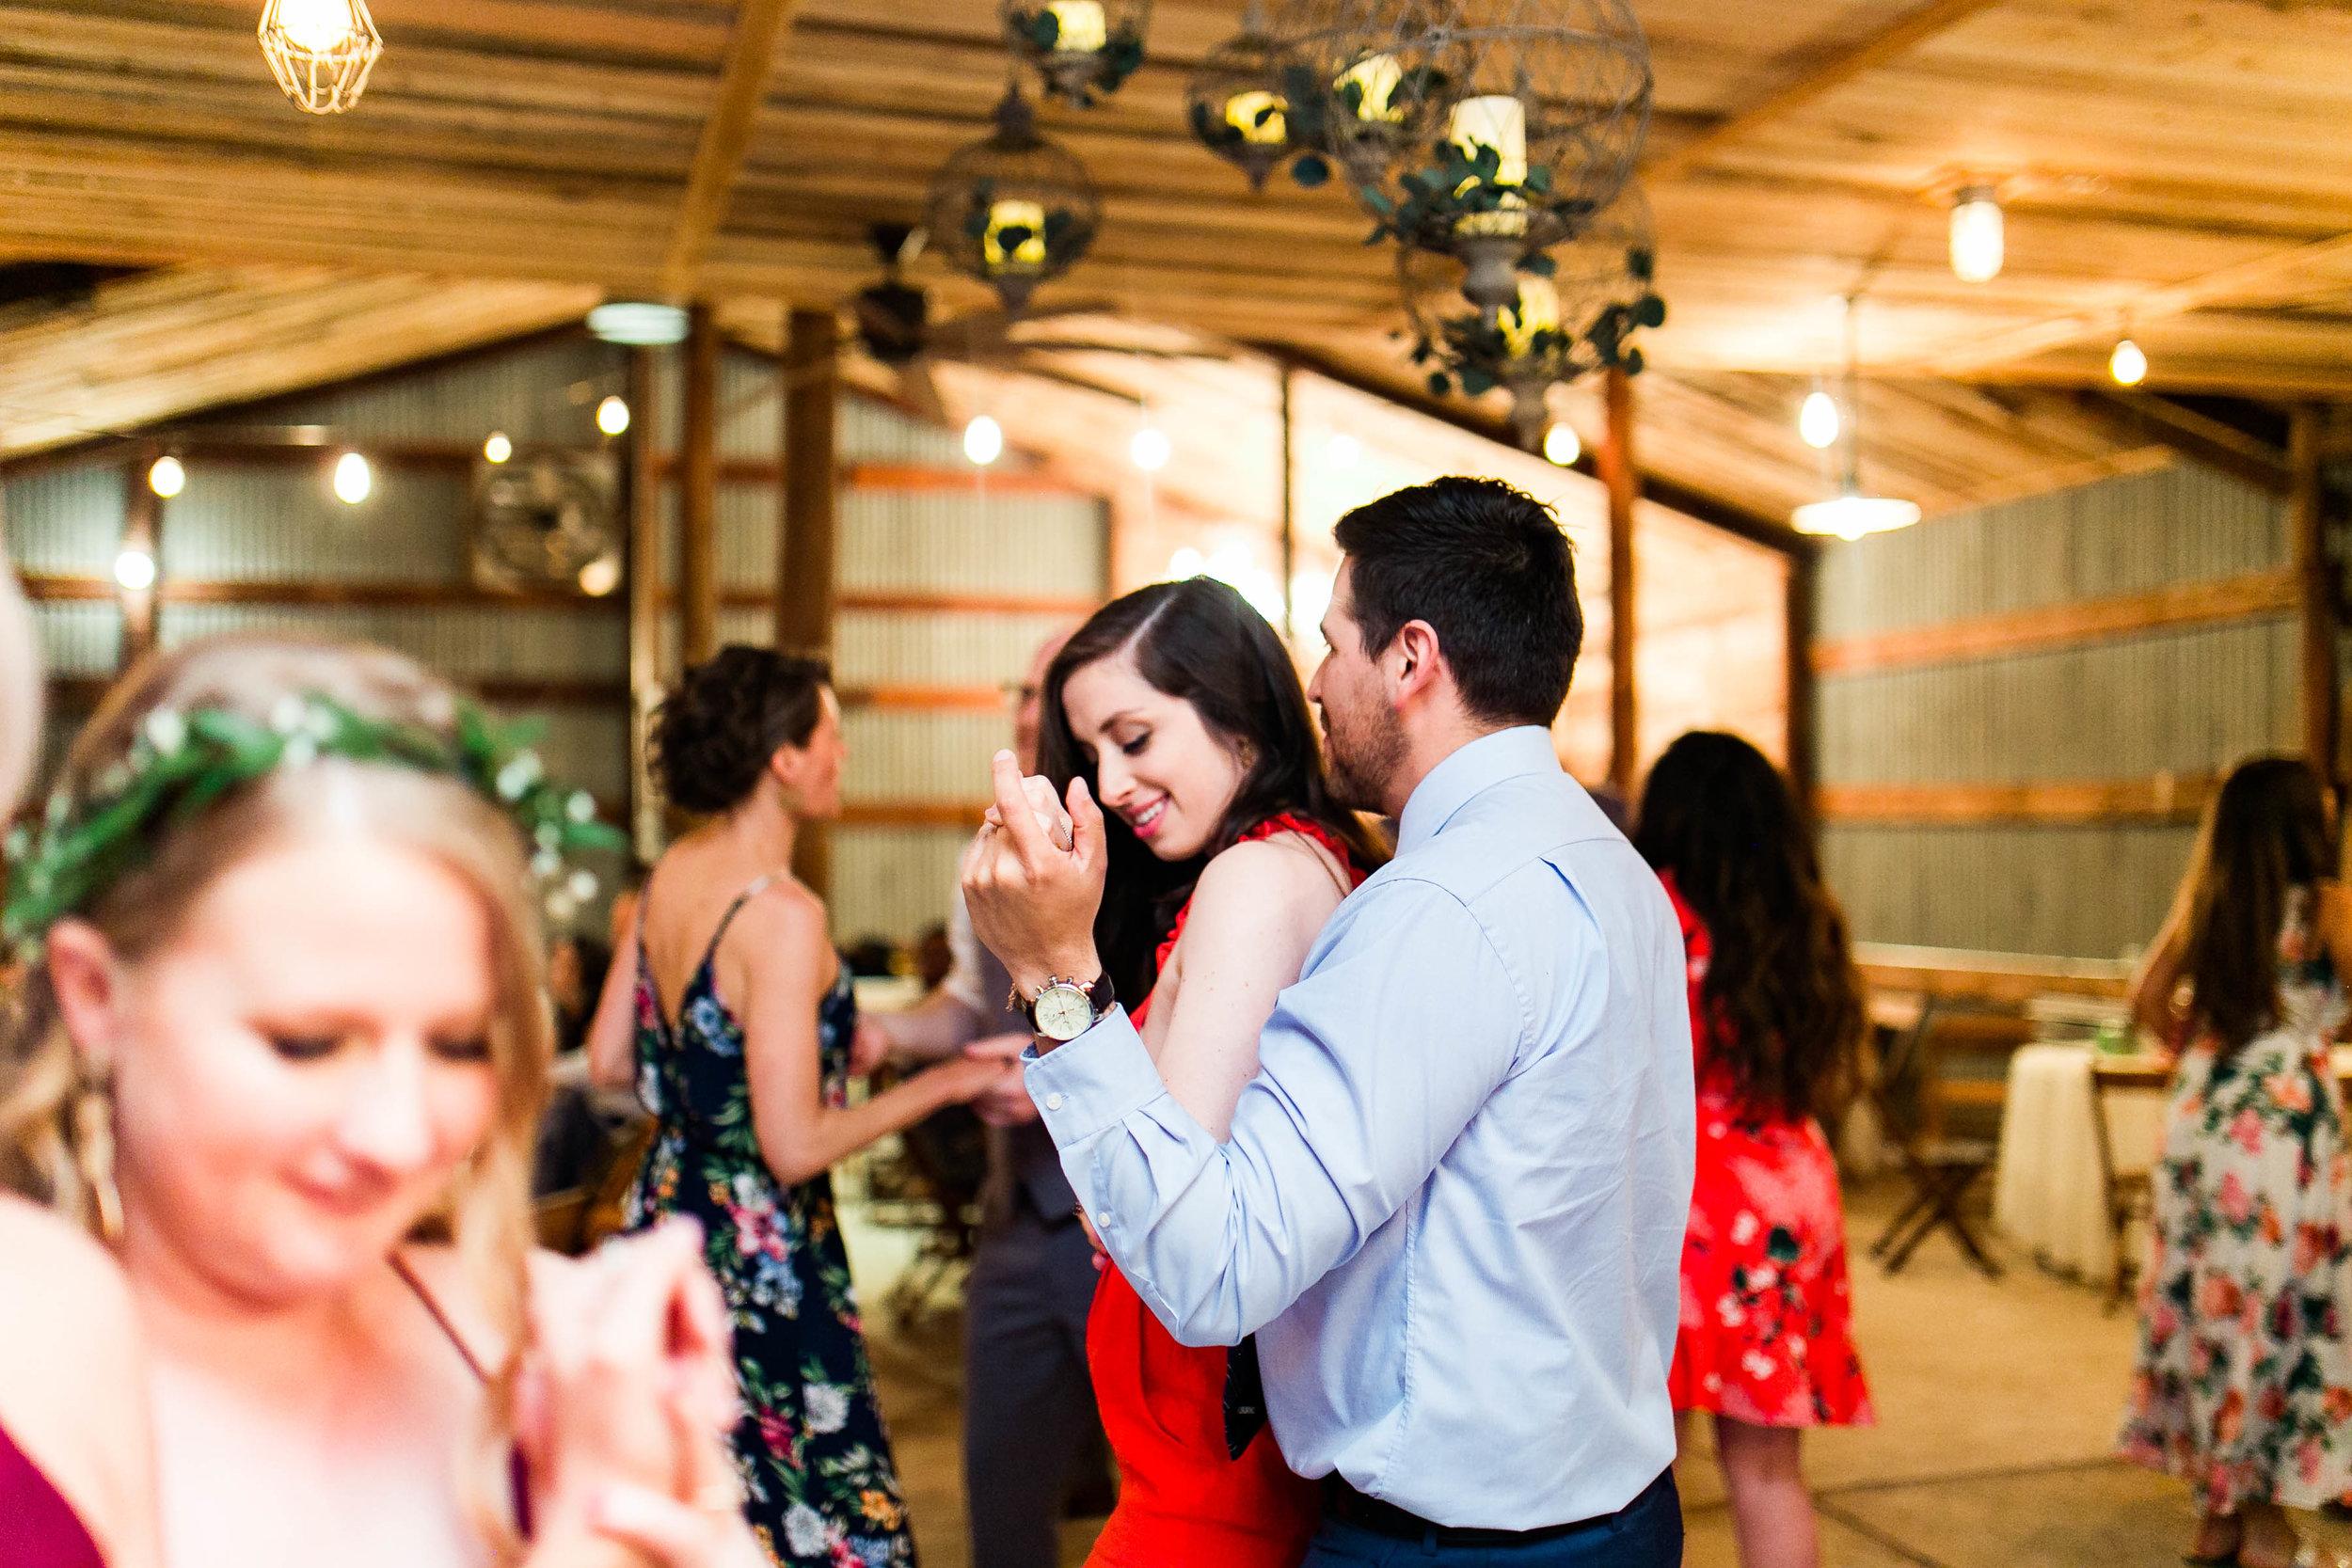 armstrong-wedding-699.jpg